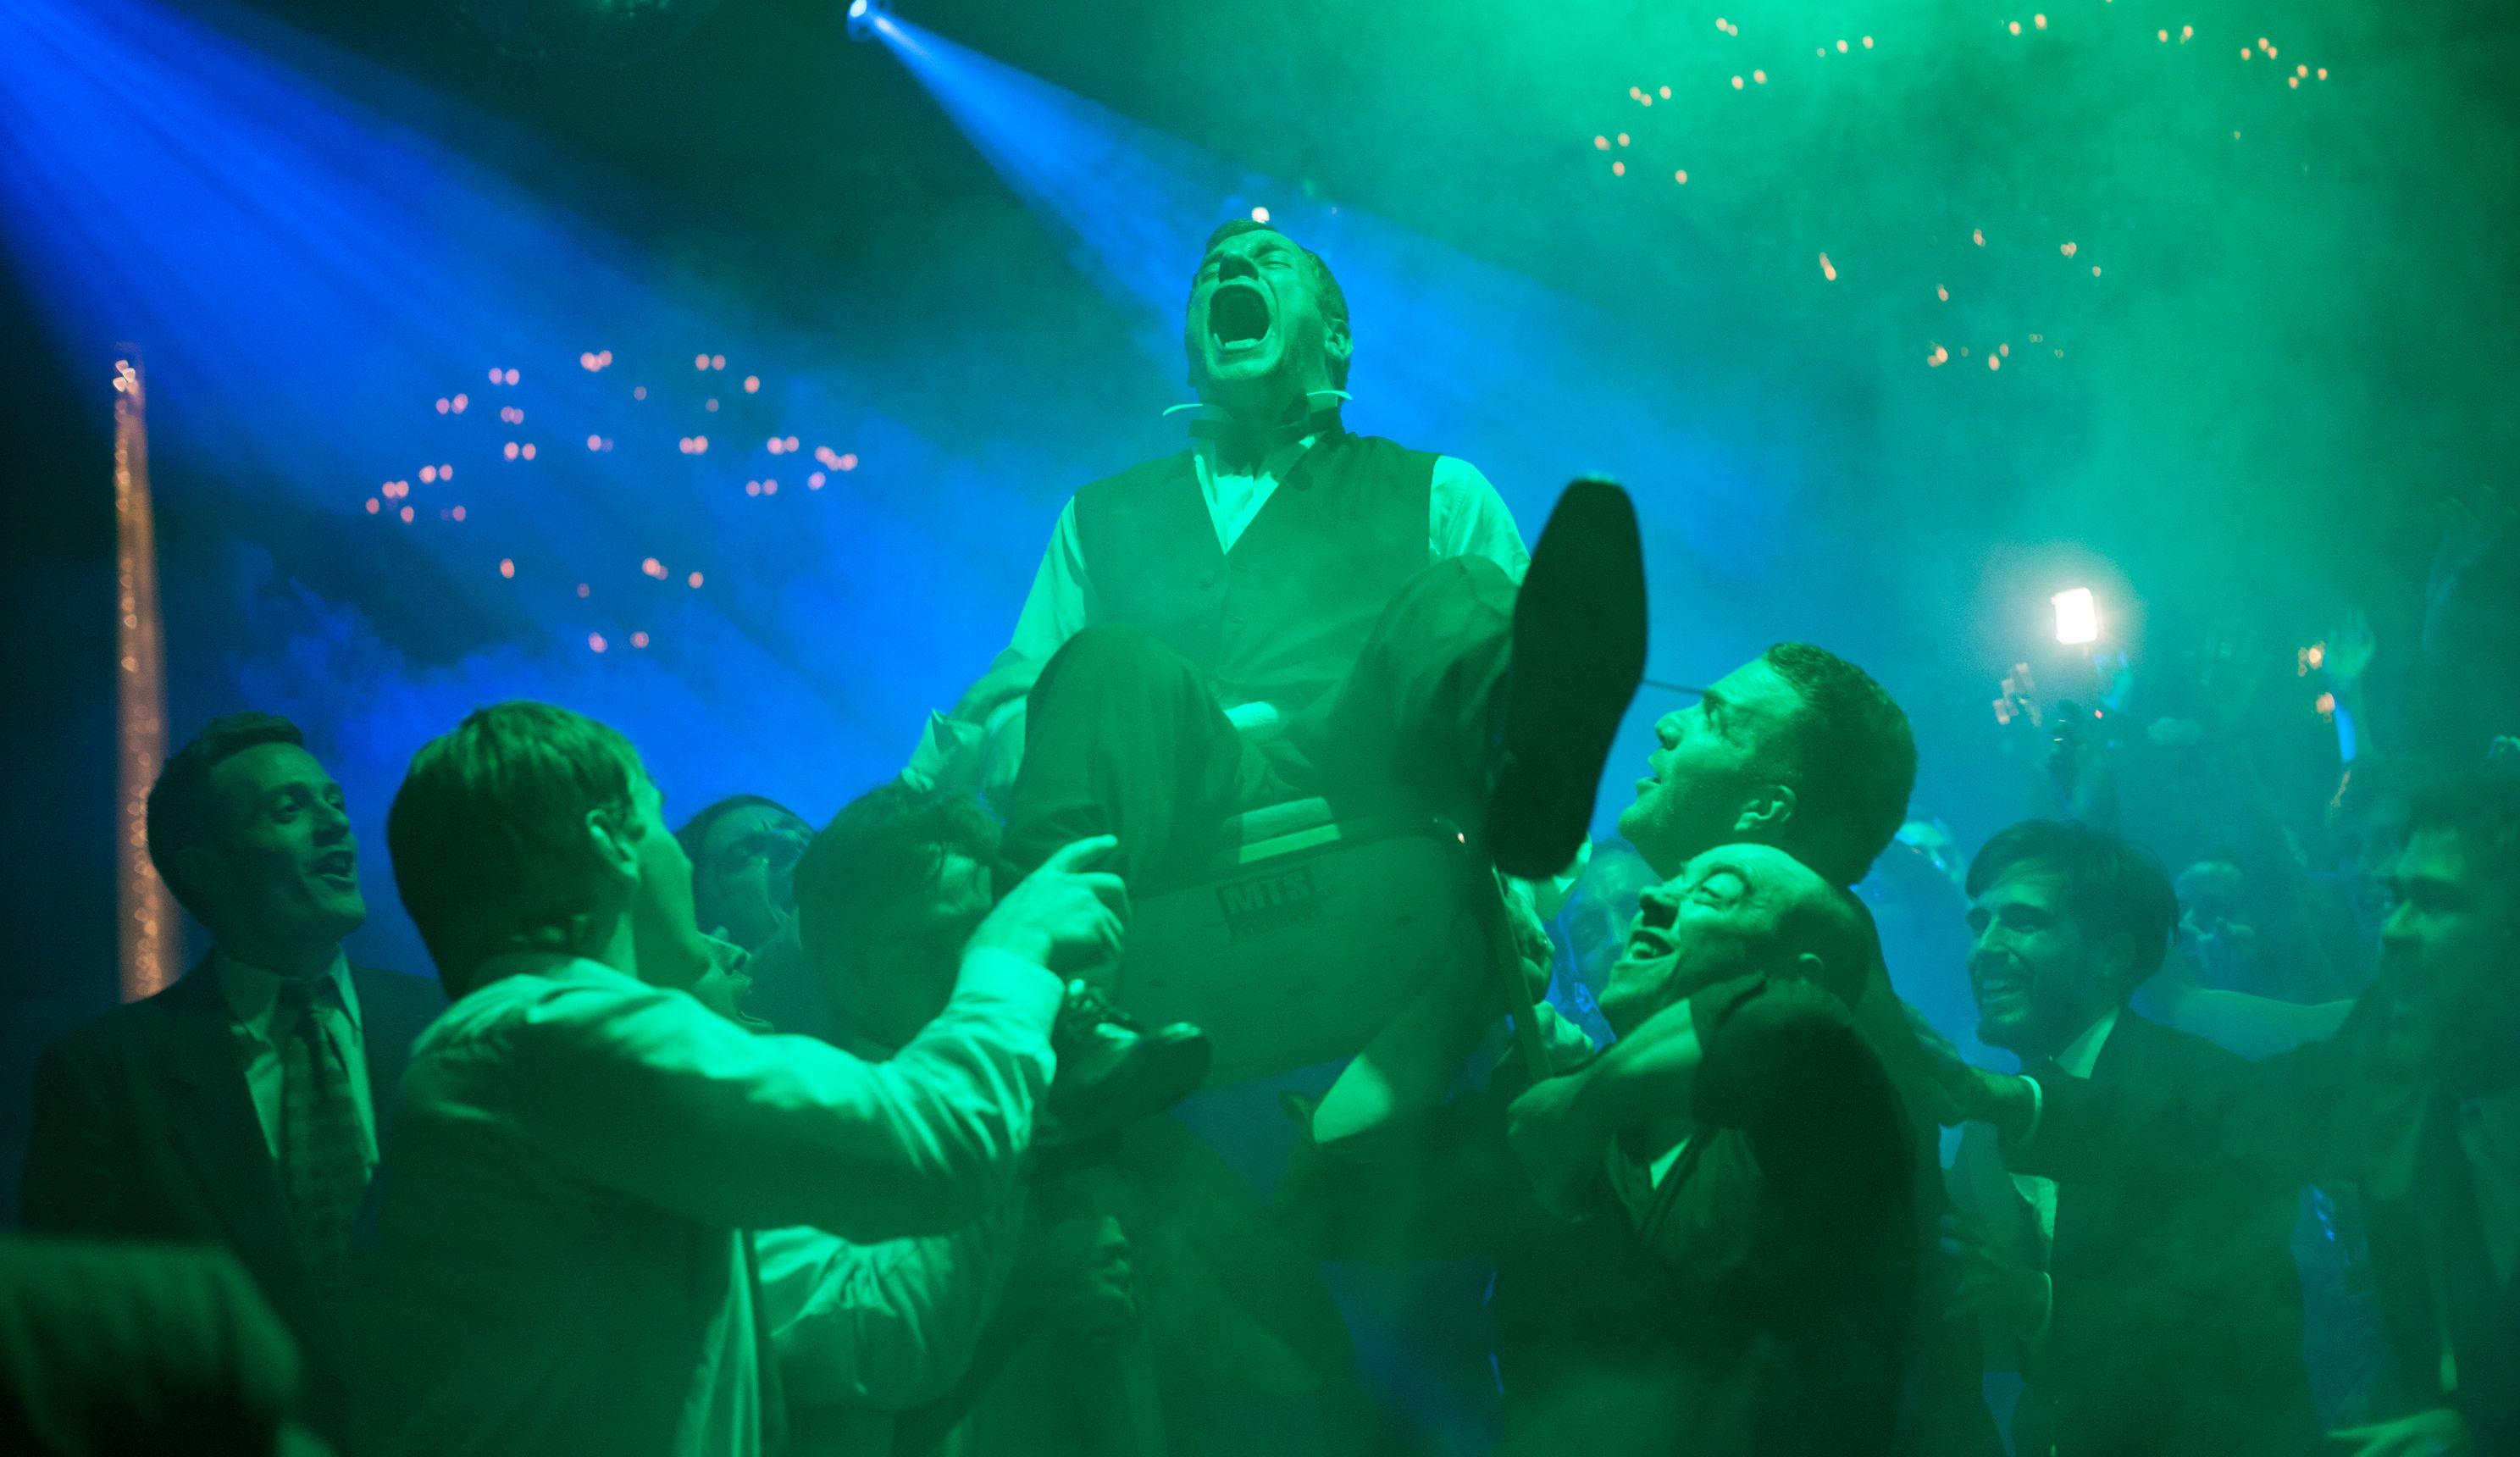 Diego Gentile as Ariel - Wild Tales